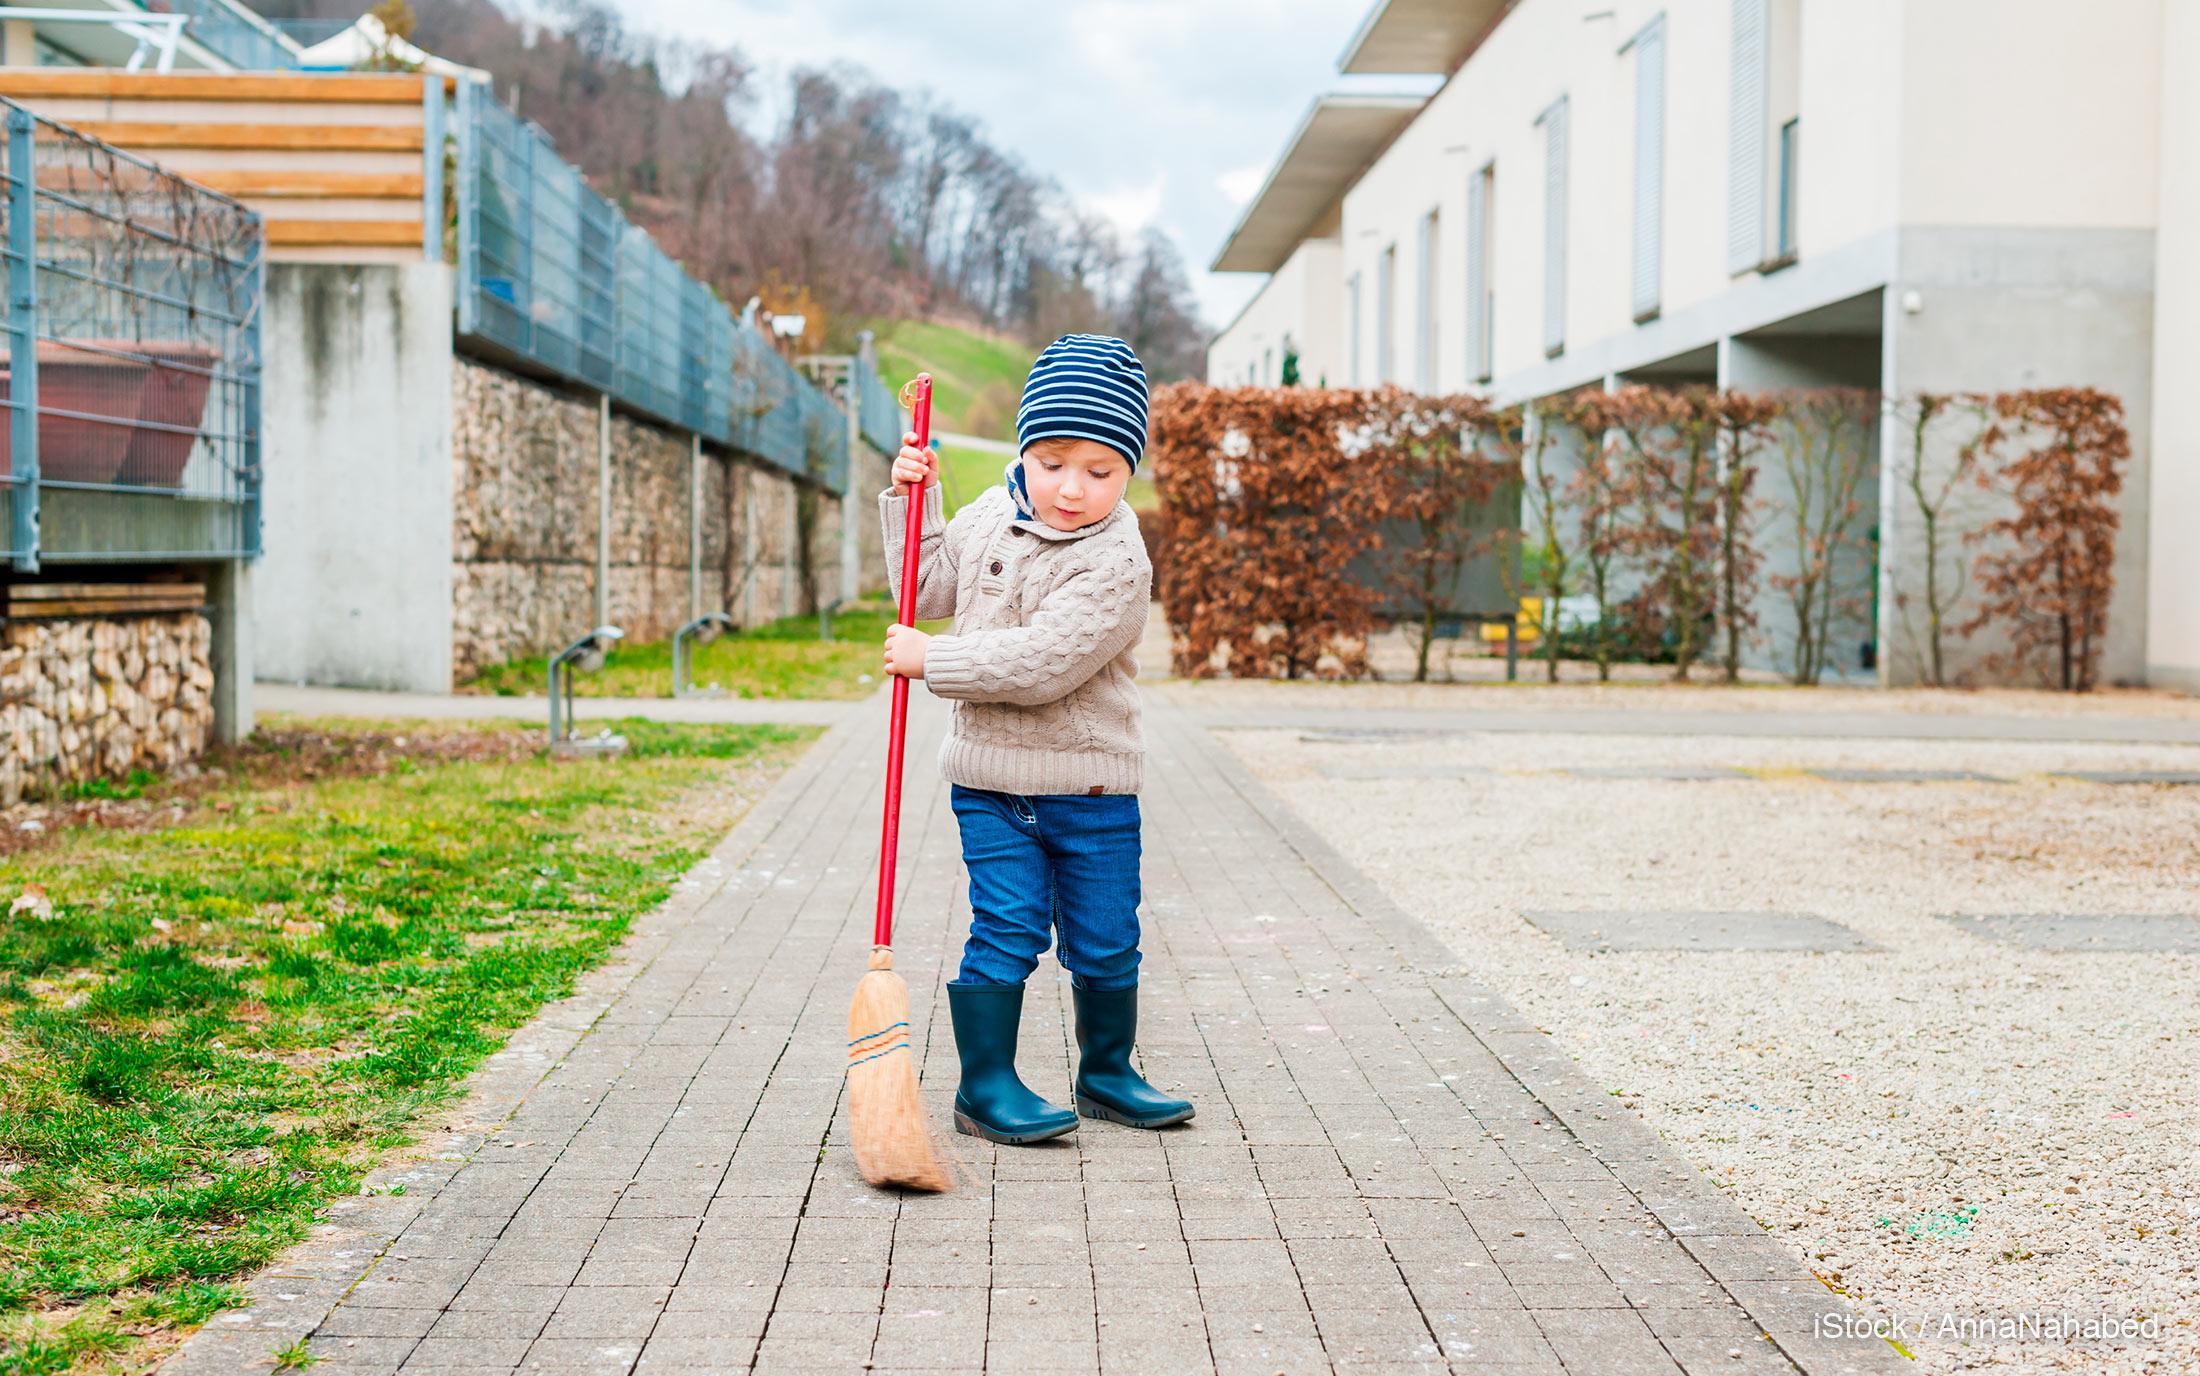 sweeping chore